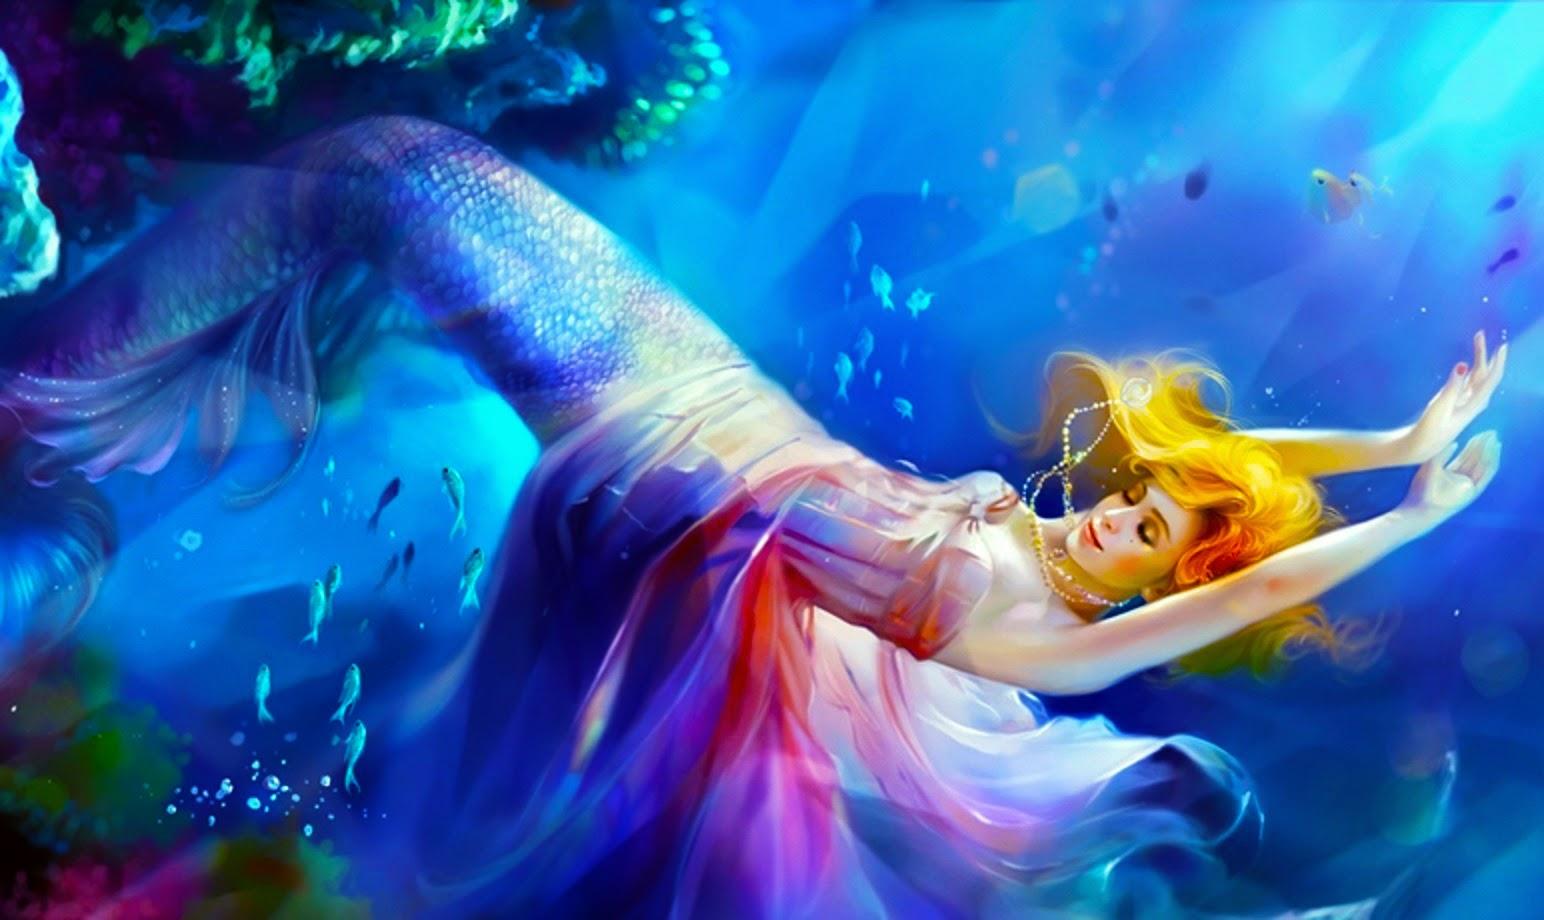 fantasy-mermaid-girl-playing-in-sea-swim-picture.jpg